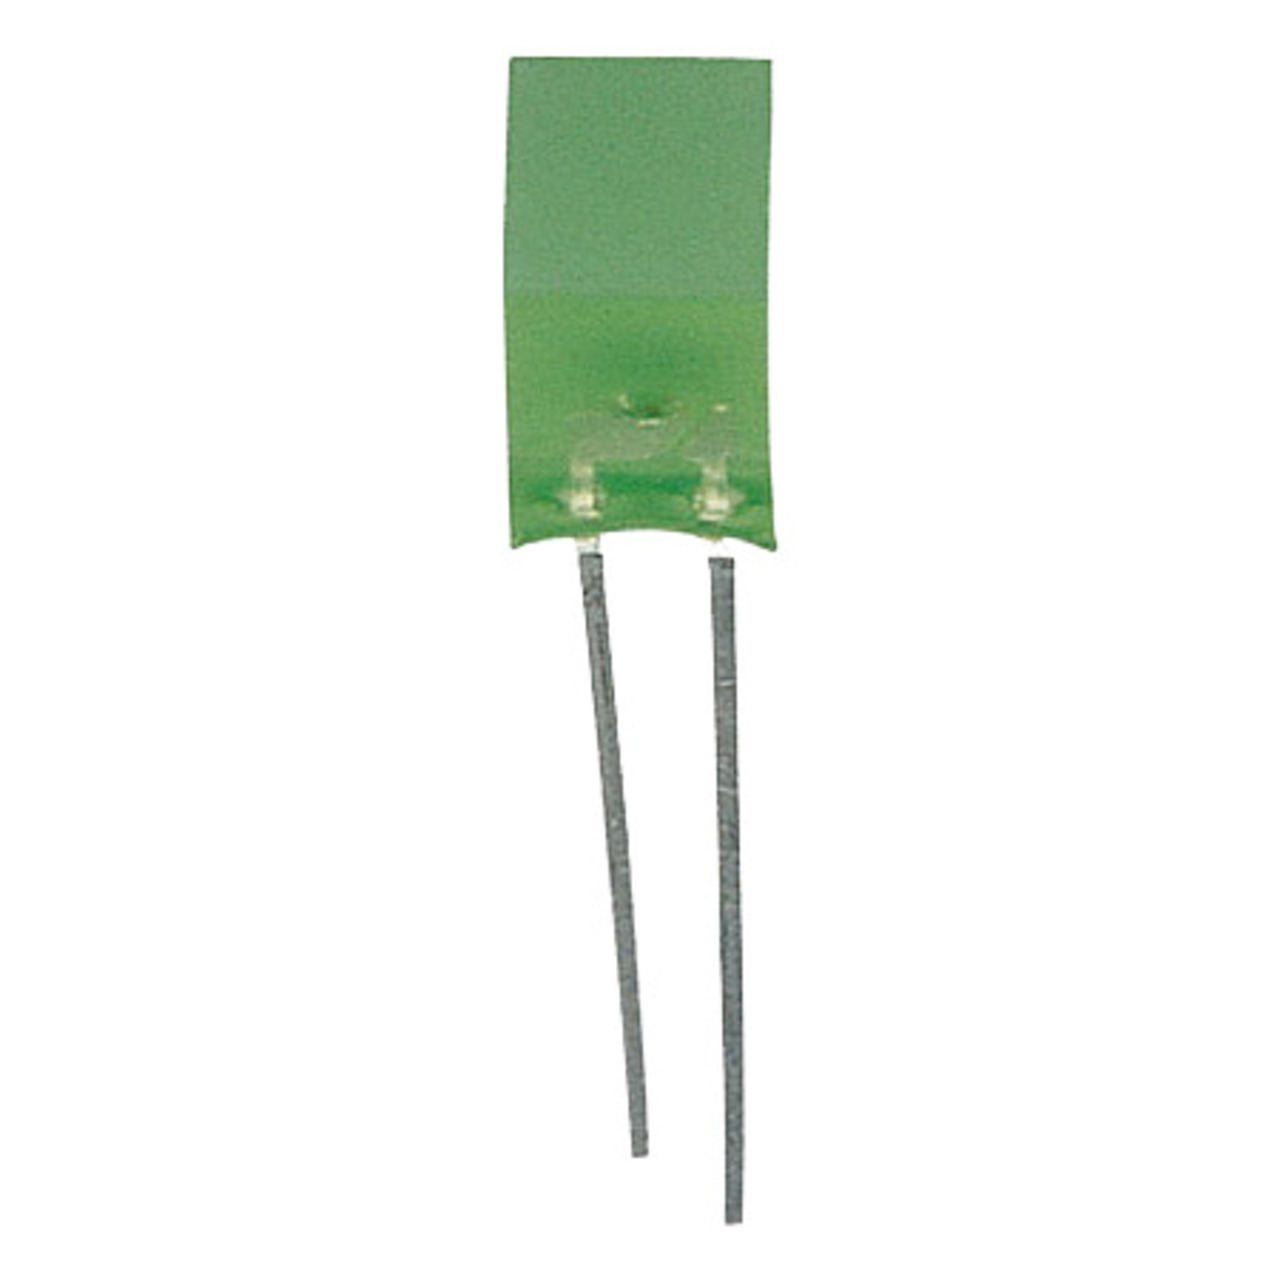 Image of 10x LED Quadratisch 5 x 5 mm Grün